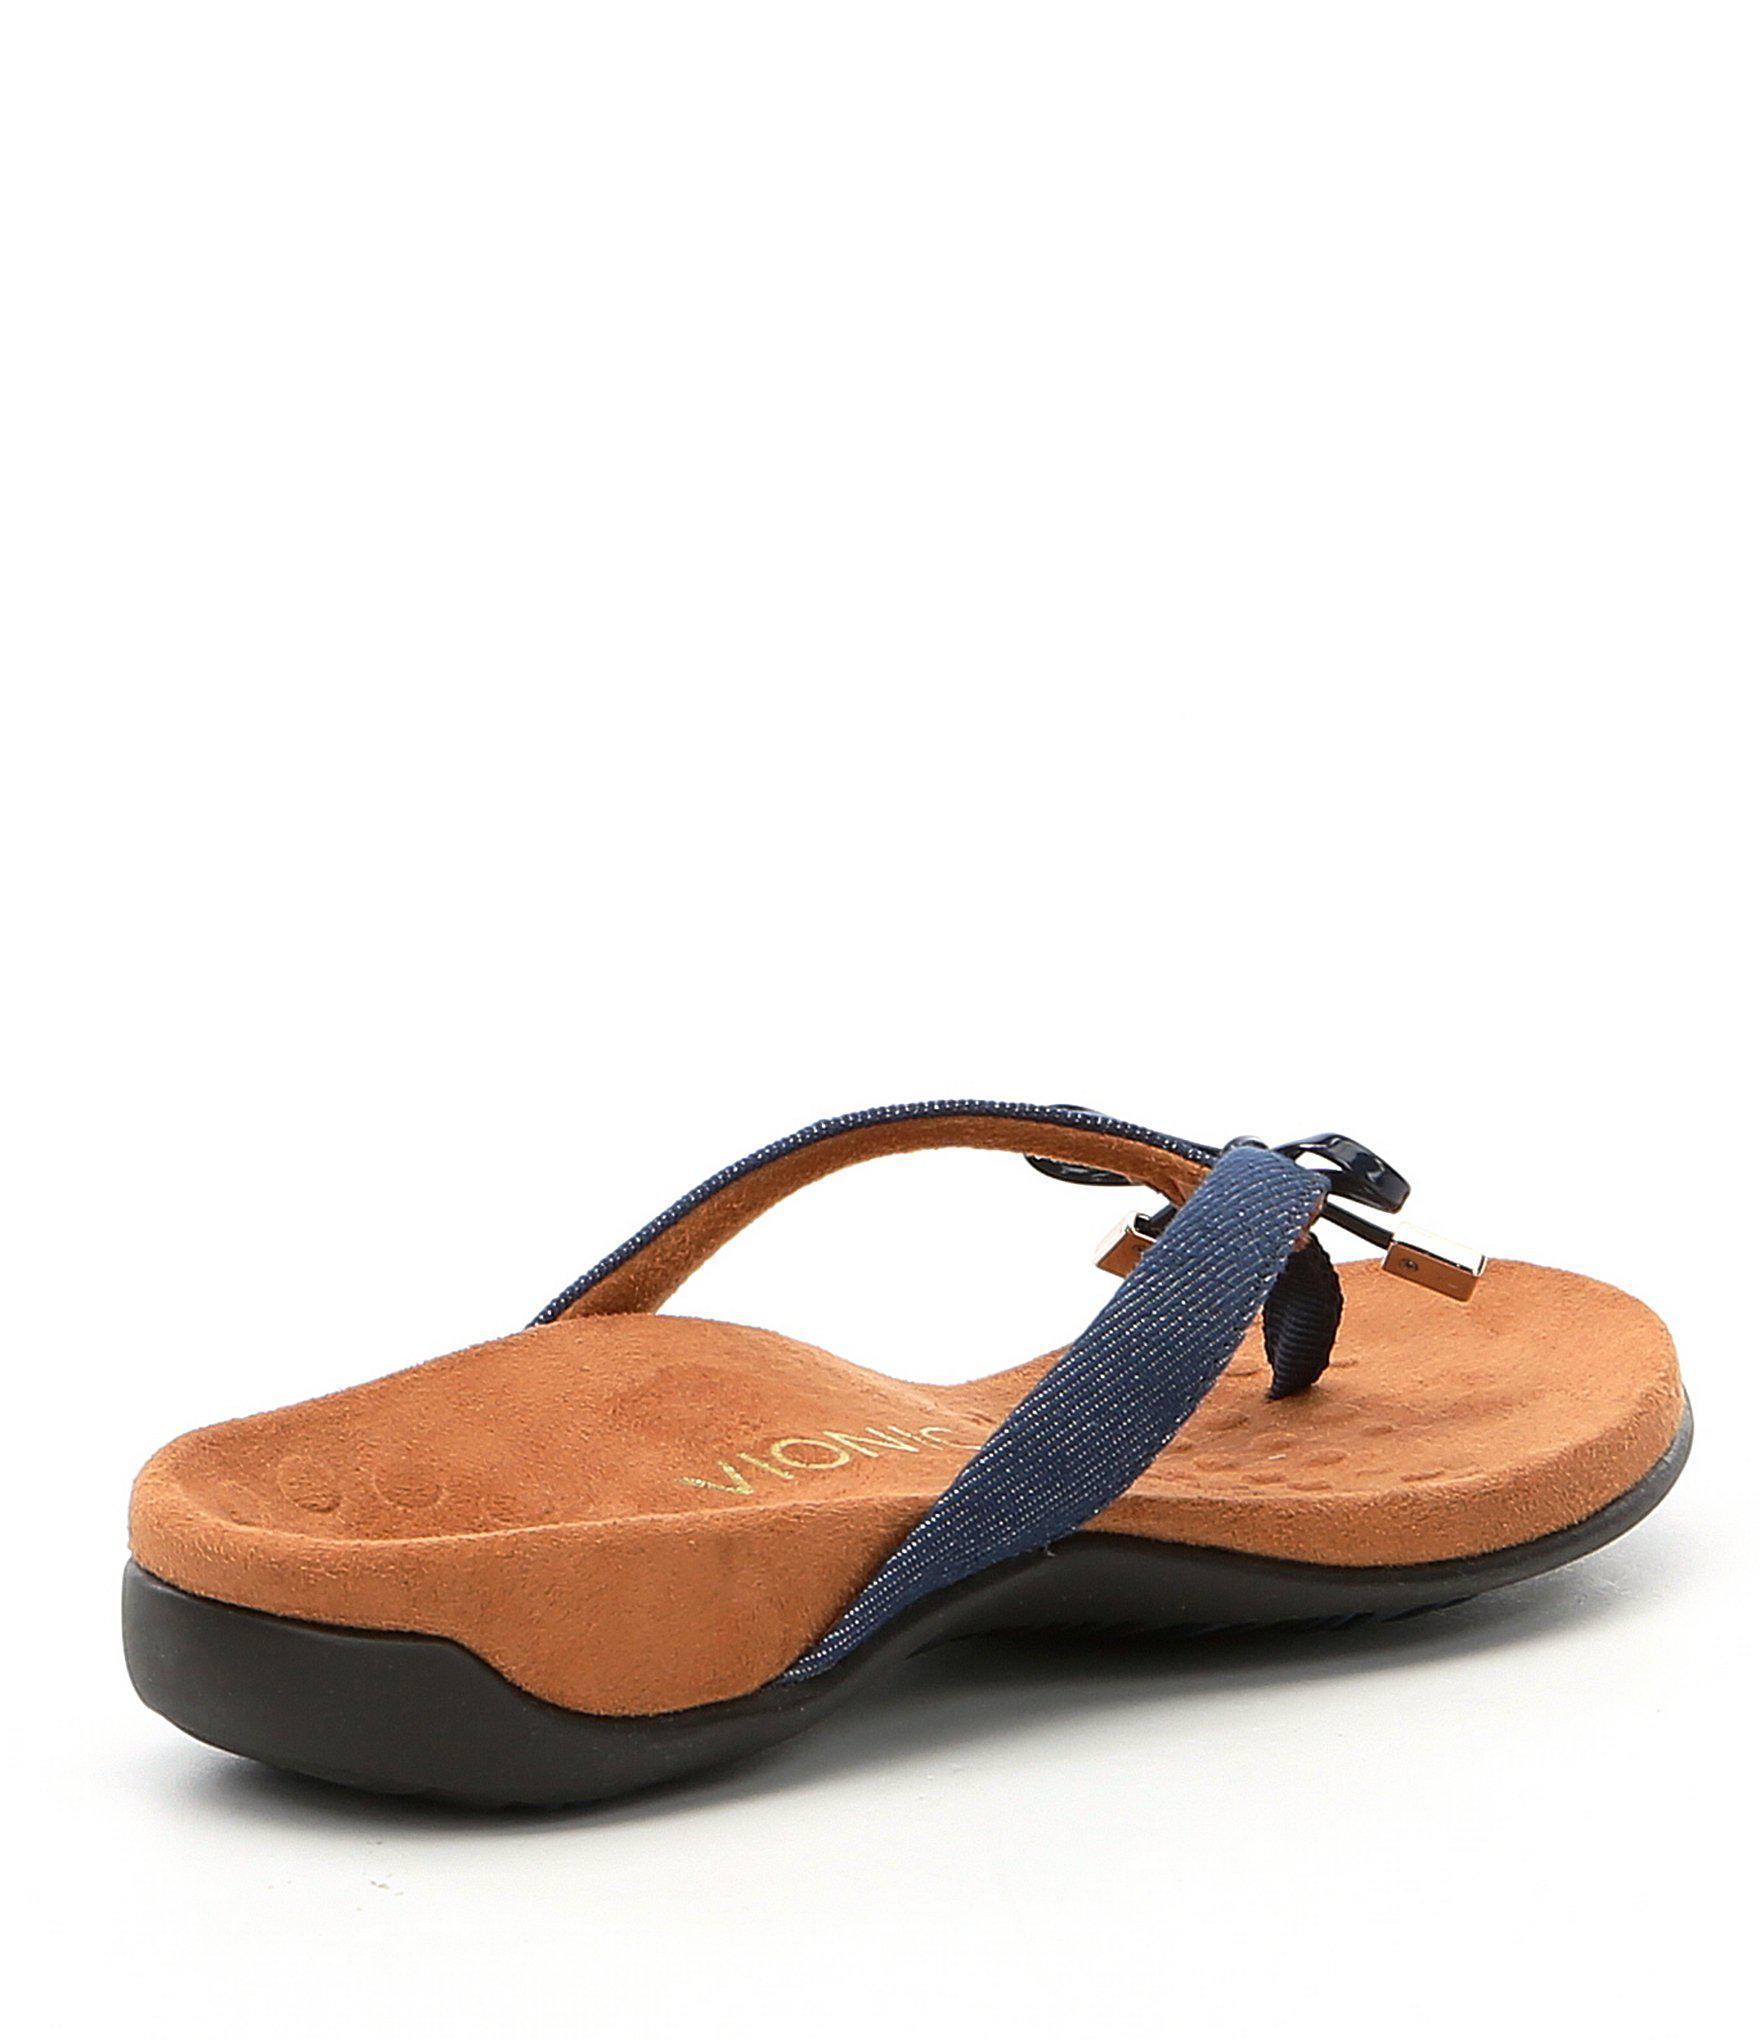 0678fa0066d8 Vionic - Blue Bella Ii Bow Detail Denim Flip-flops - Lyst. View fullscreen